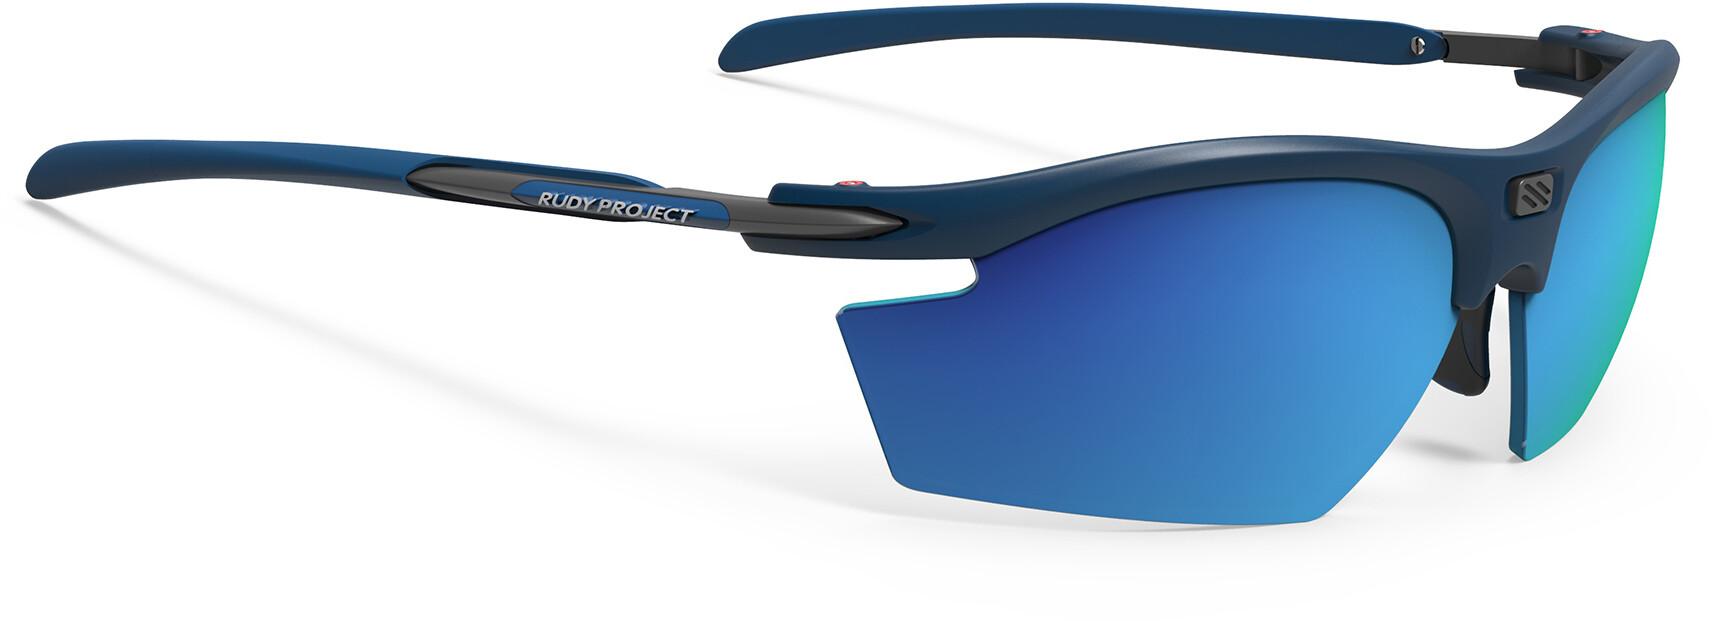 Rudy Project Rydon Cykelbriller, blue navy matte - rp optics multilaser blue | Briller